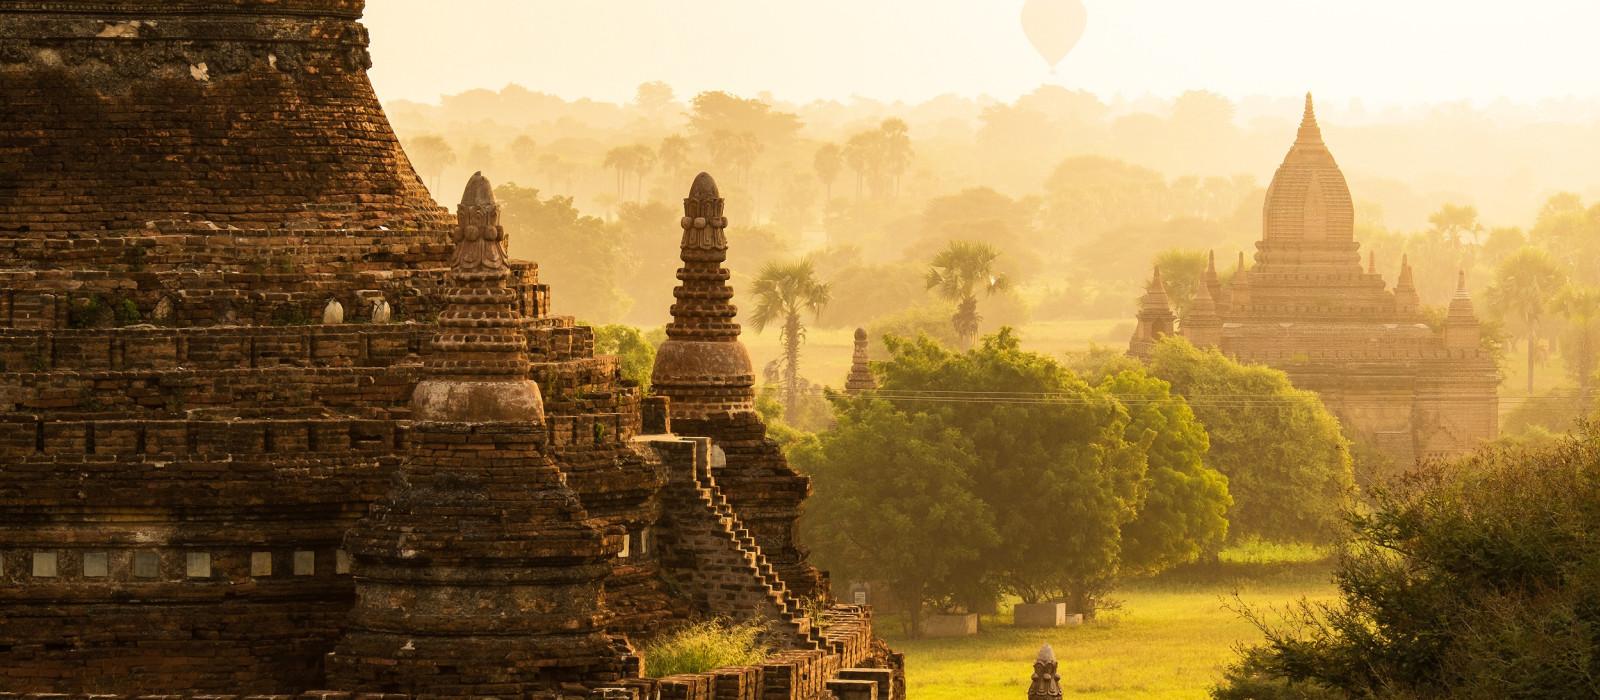 Hotel Road to Mandalay Kreuzfahrt Myanmar